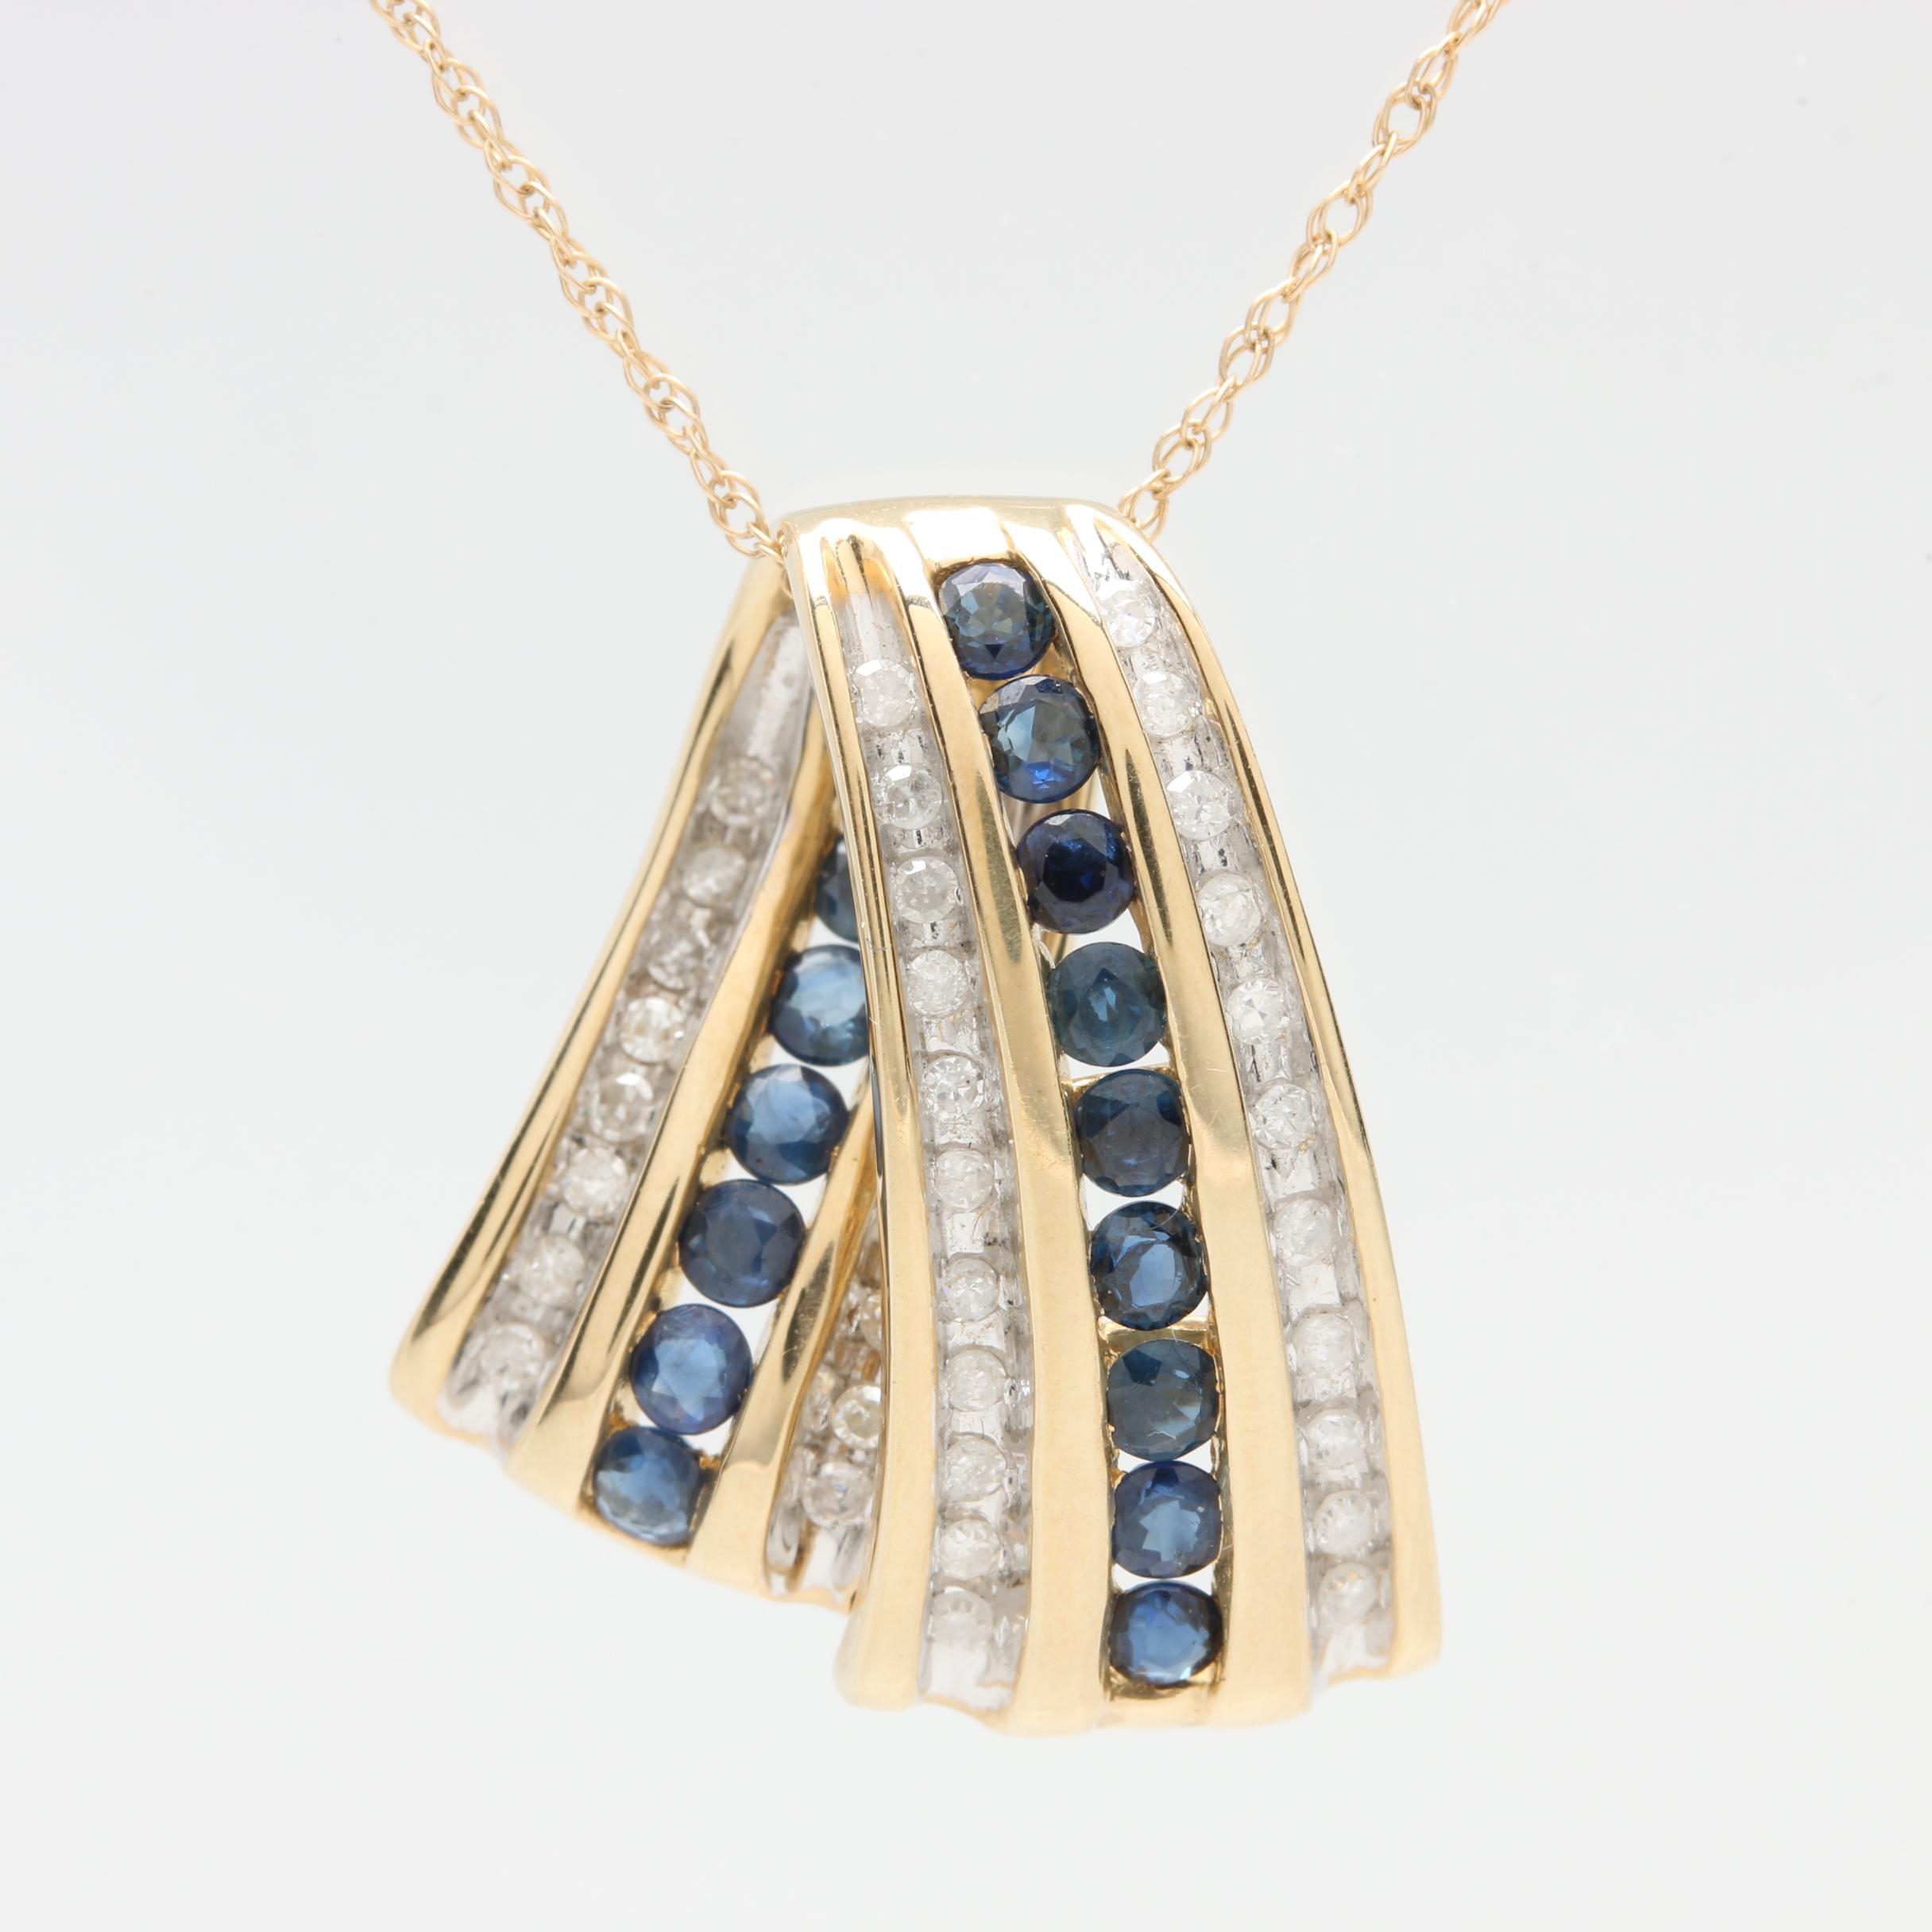 Alwand Vahan 10K Yellow Gold Blue Sapphire and Diamond Pendant Necklace